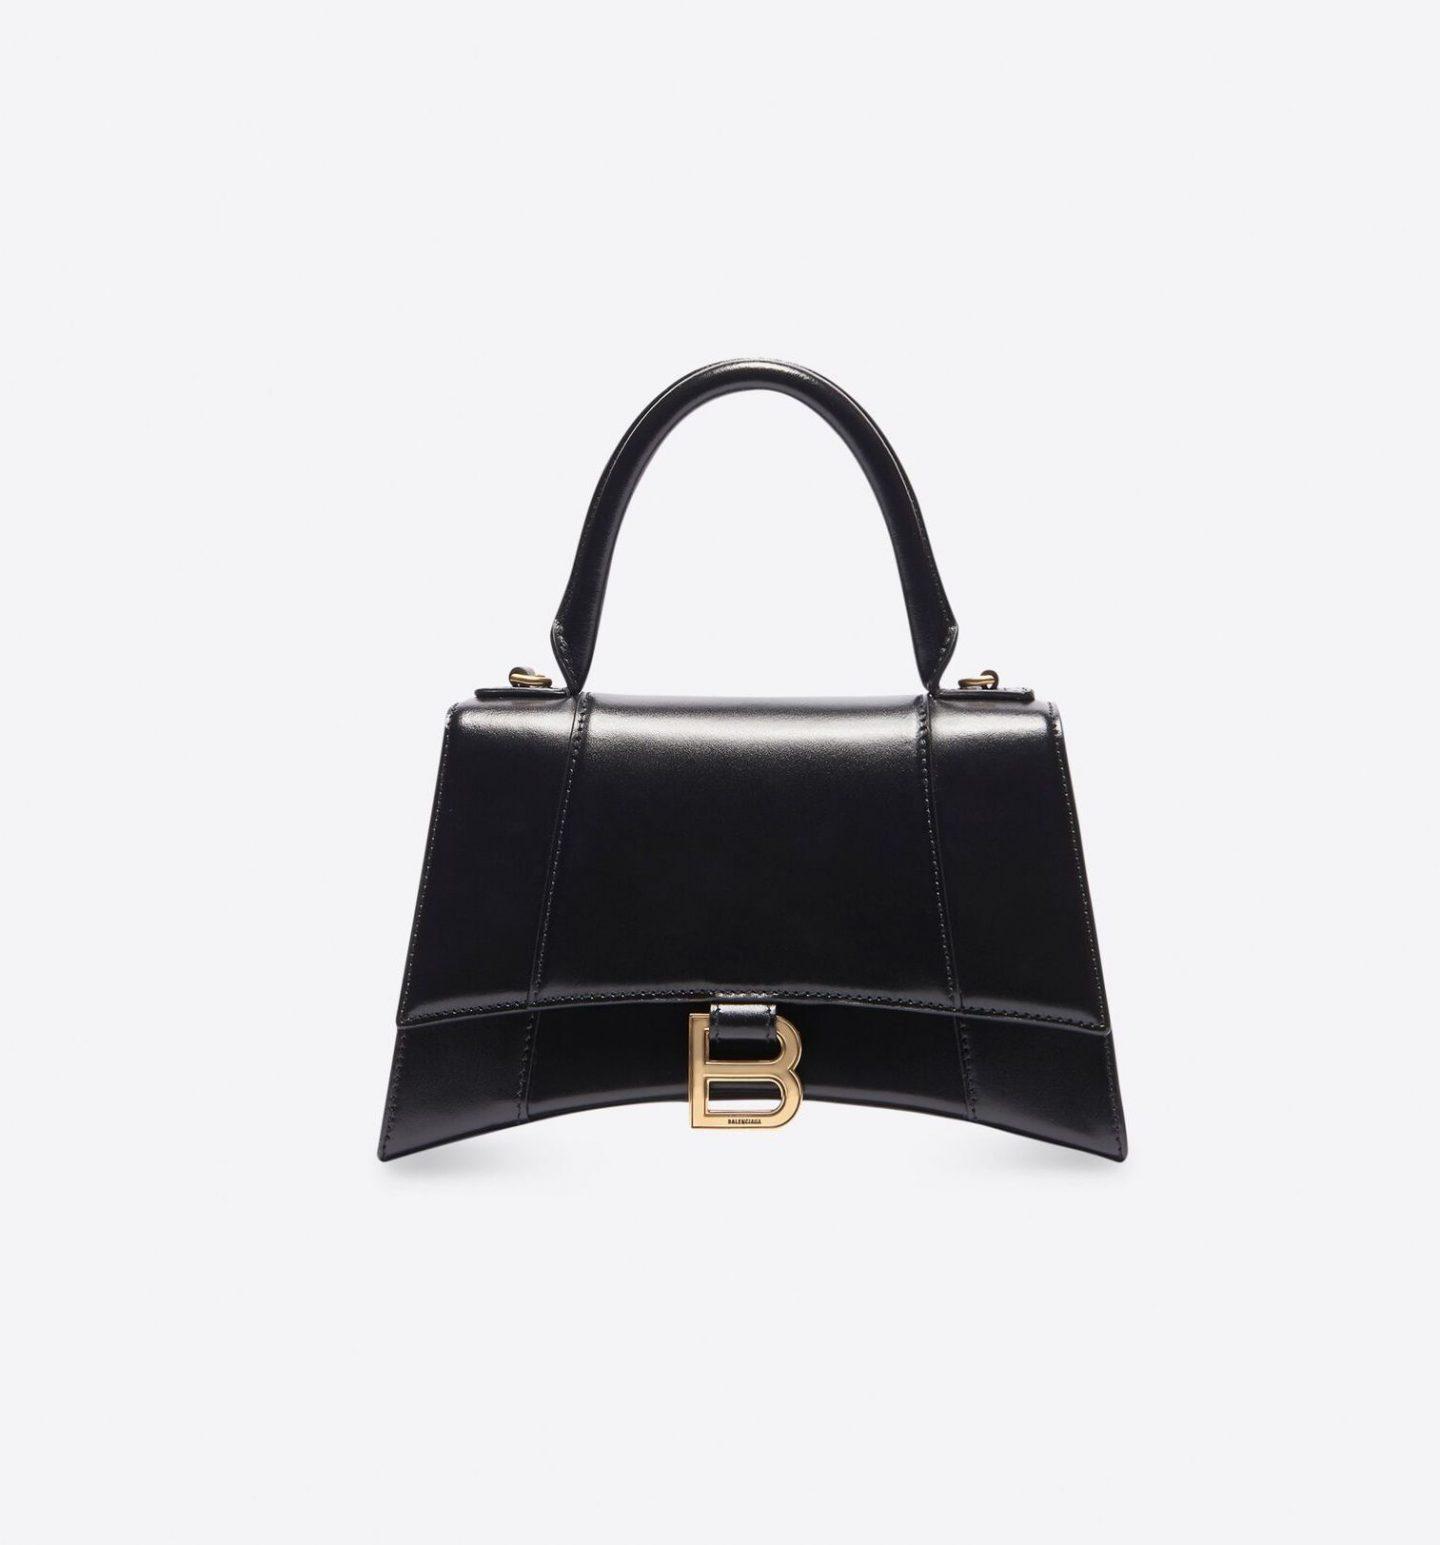 Black Hourglass minimalist bag from Balenciaga